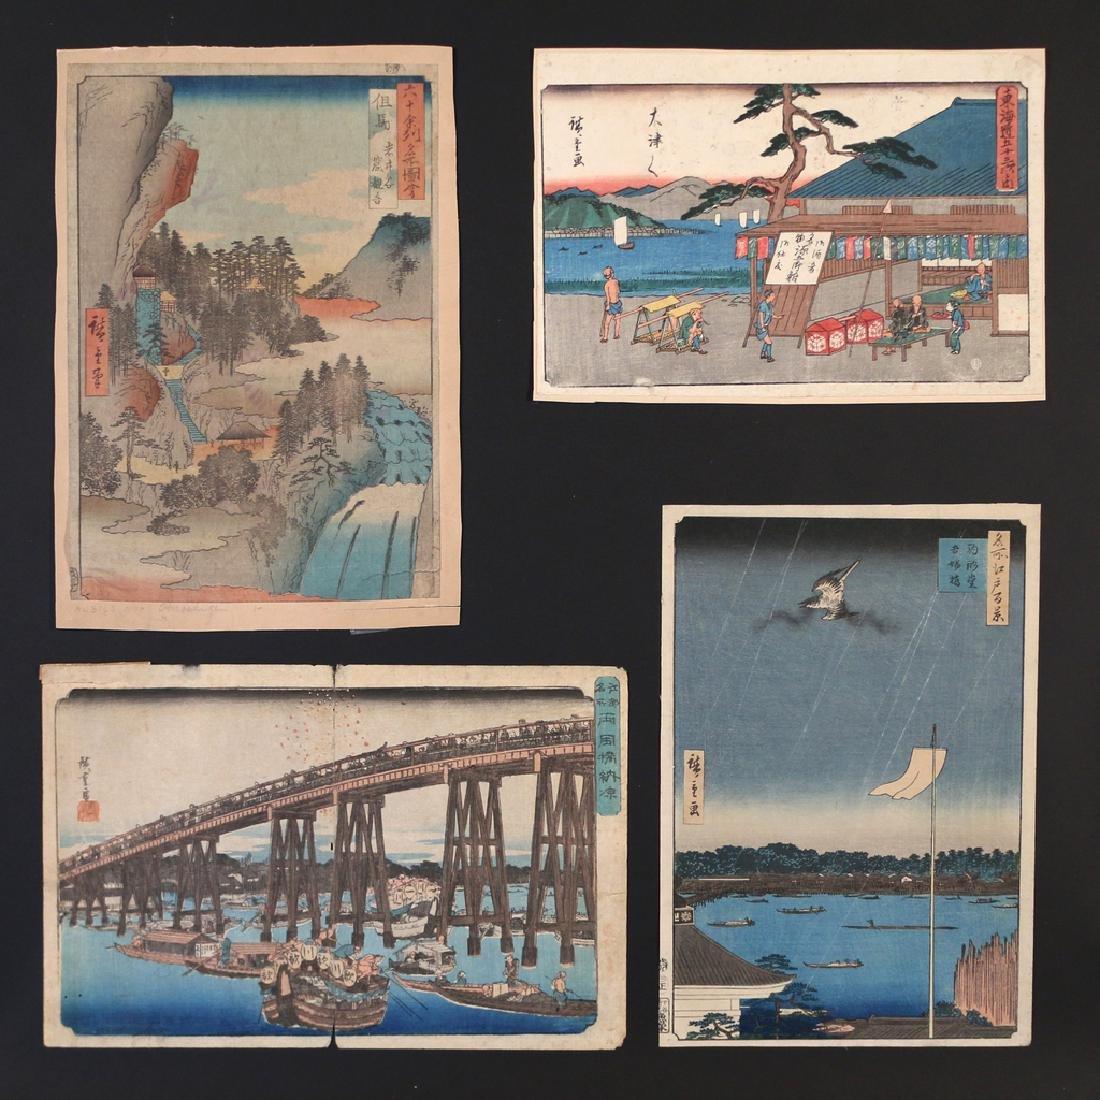 (4pc) EARLY UTAGAWA HIROSHIGE WOODBLOCK PRINTS